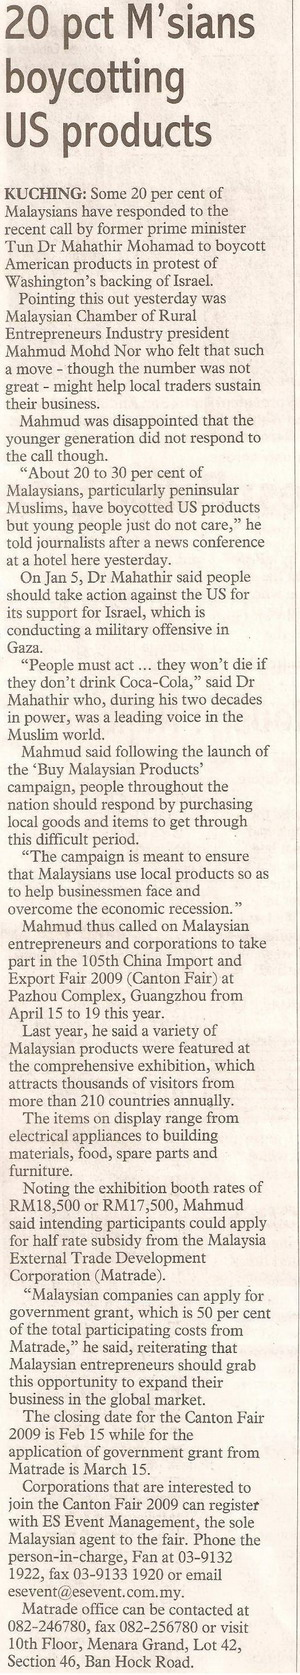 thesundaypost. 2009. 20 pct M'sians boycotting US products. January 18, 2008 Edition.